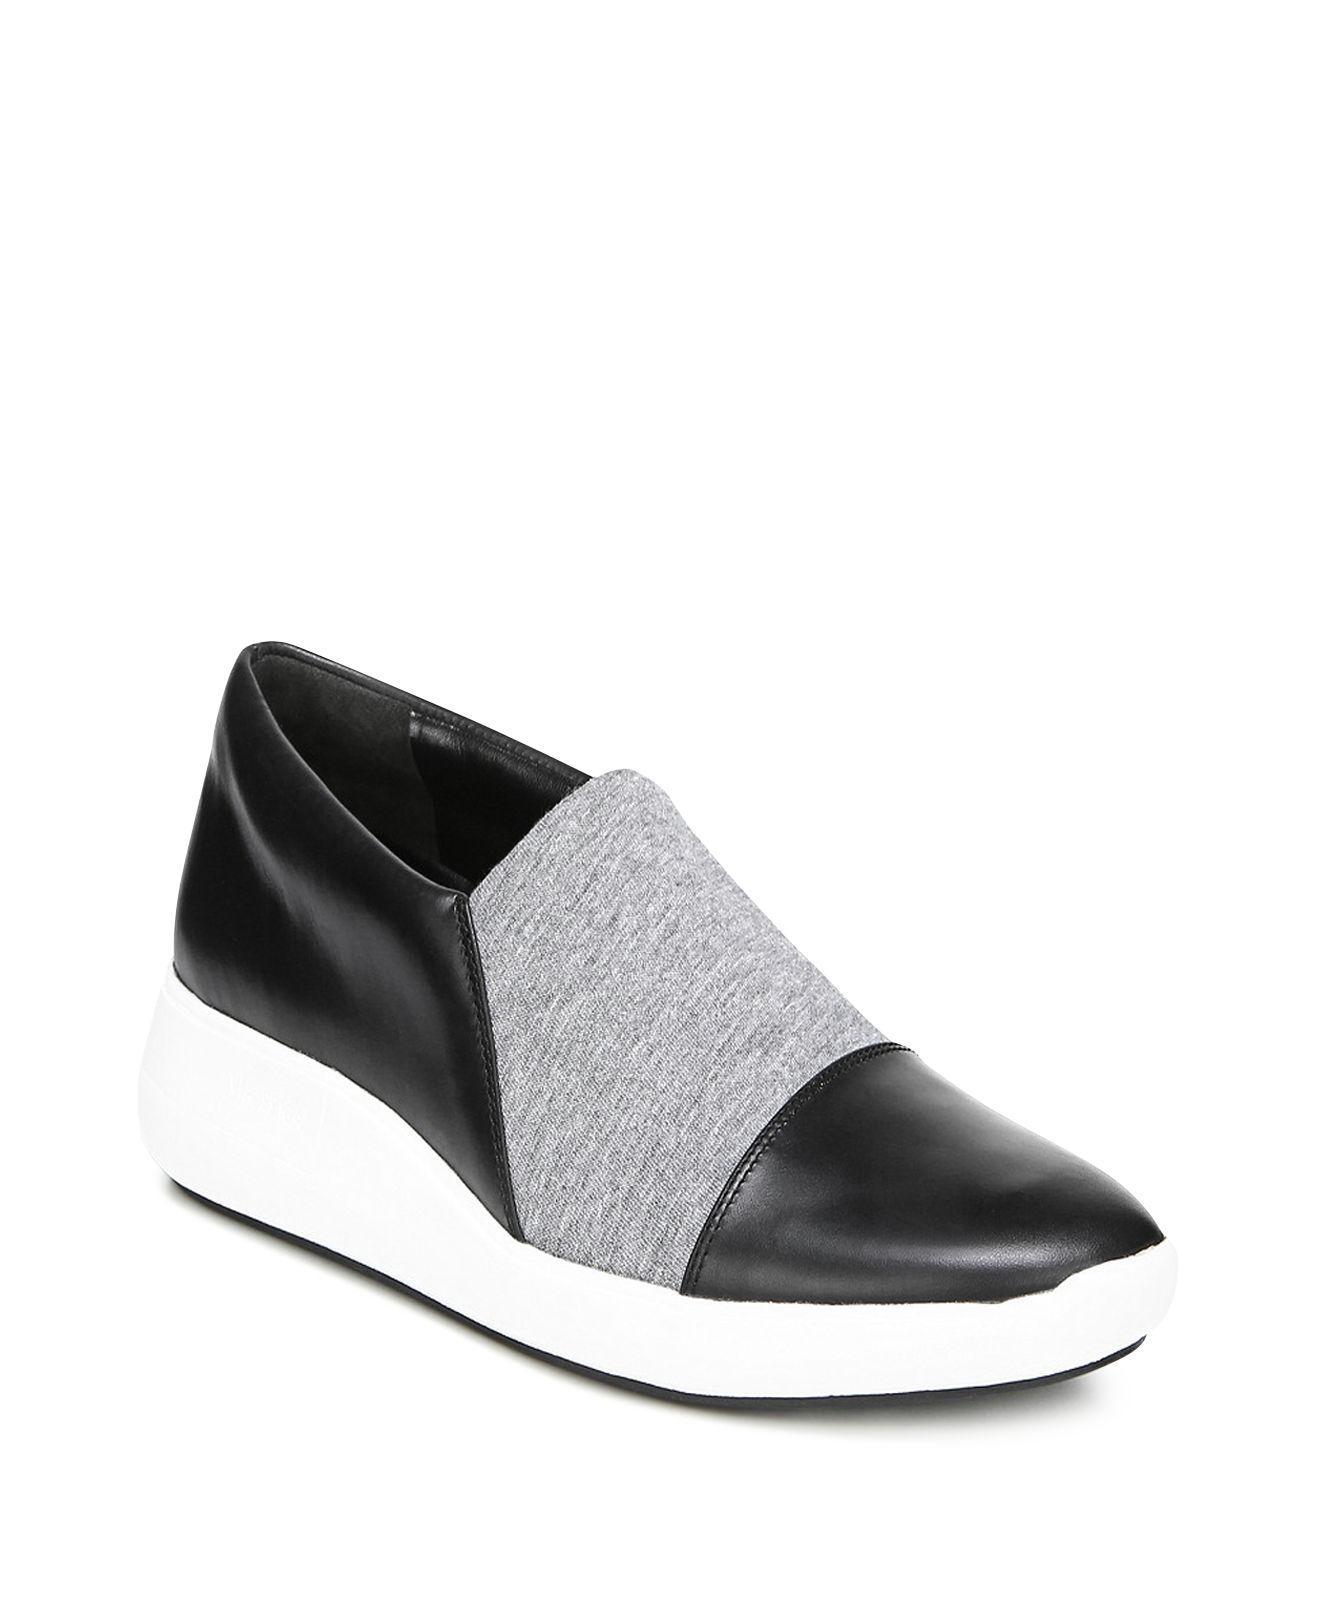 Via Spiga Women's Veila Leather & Knit Slip-On Sneakers